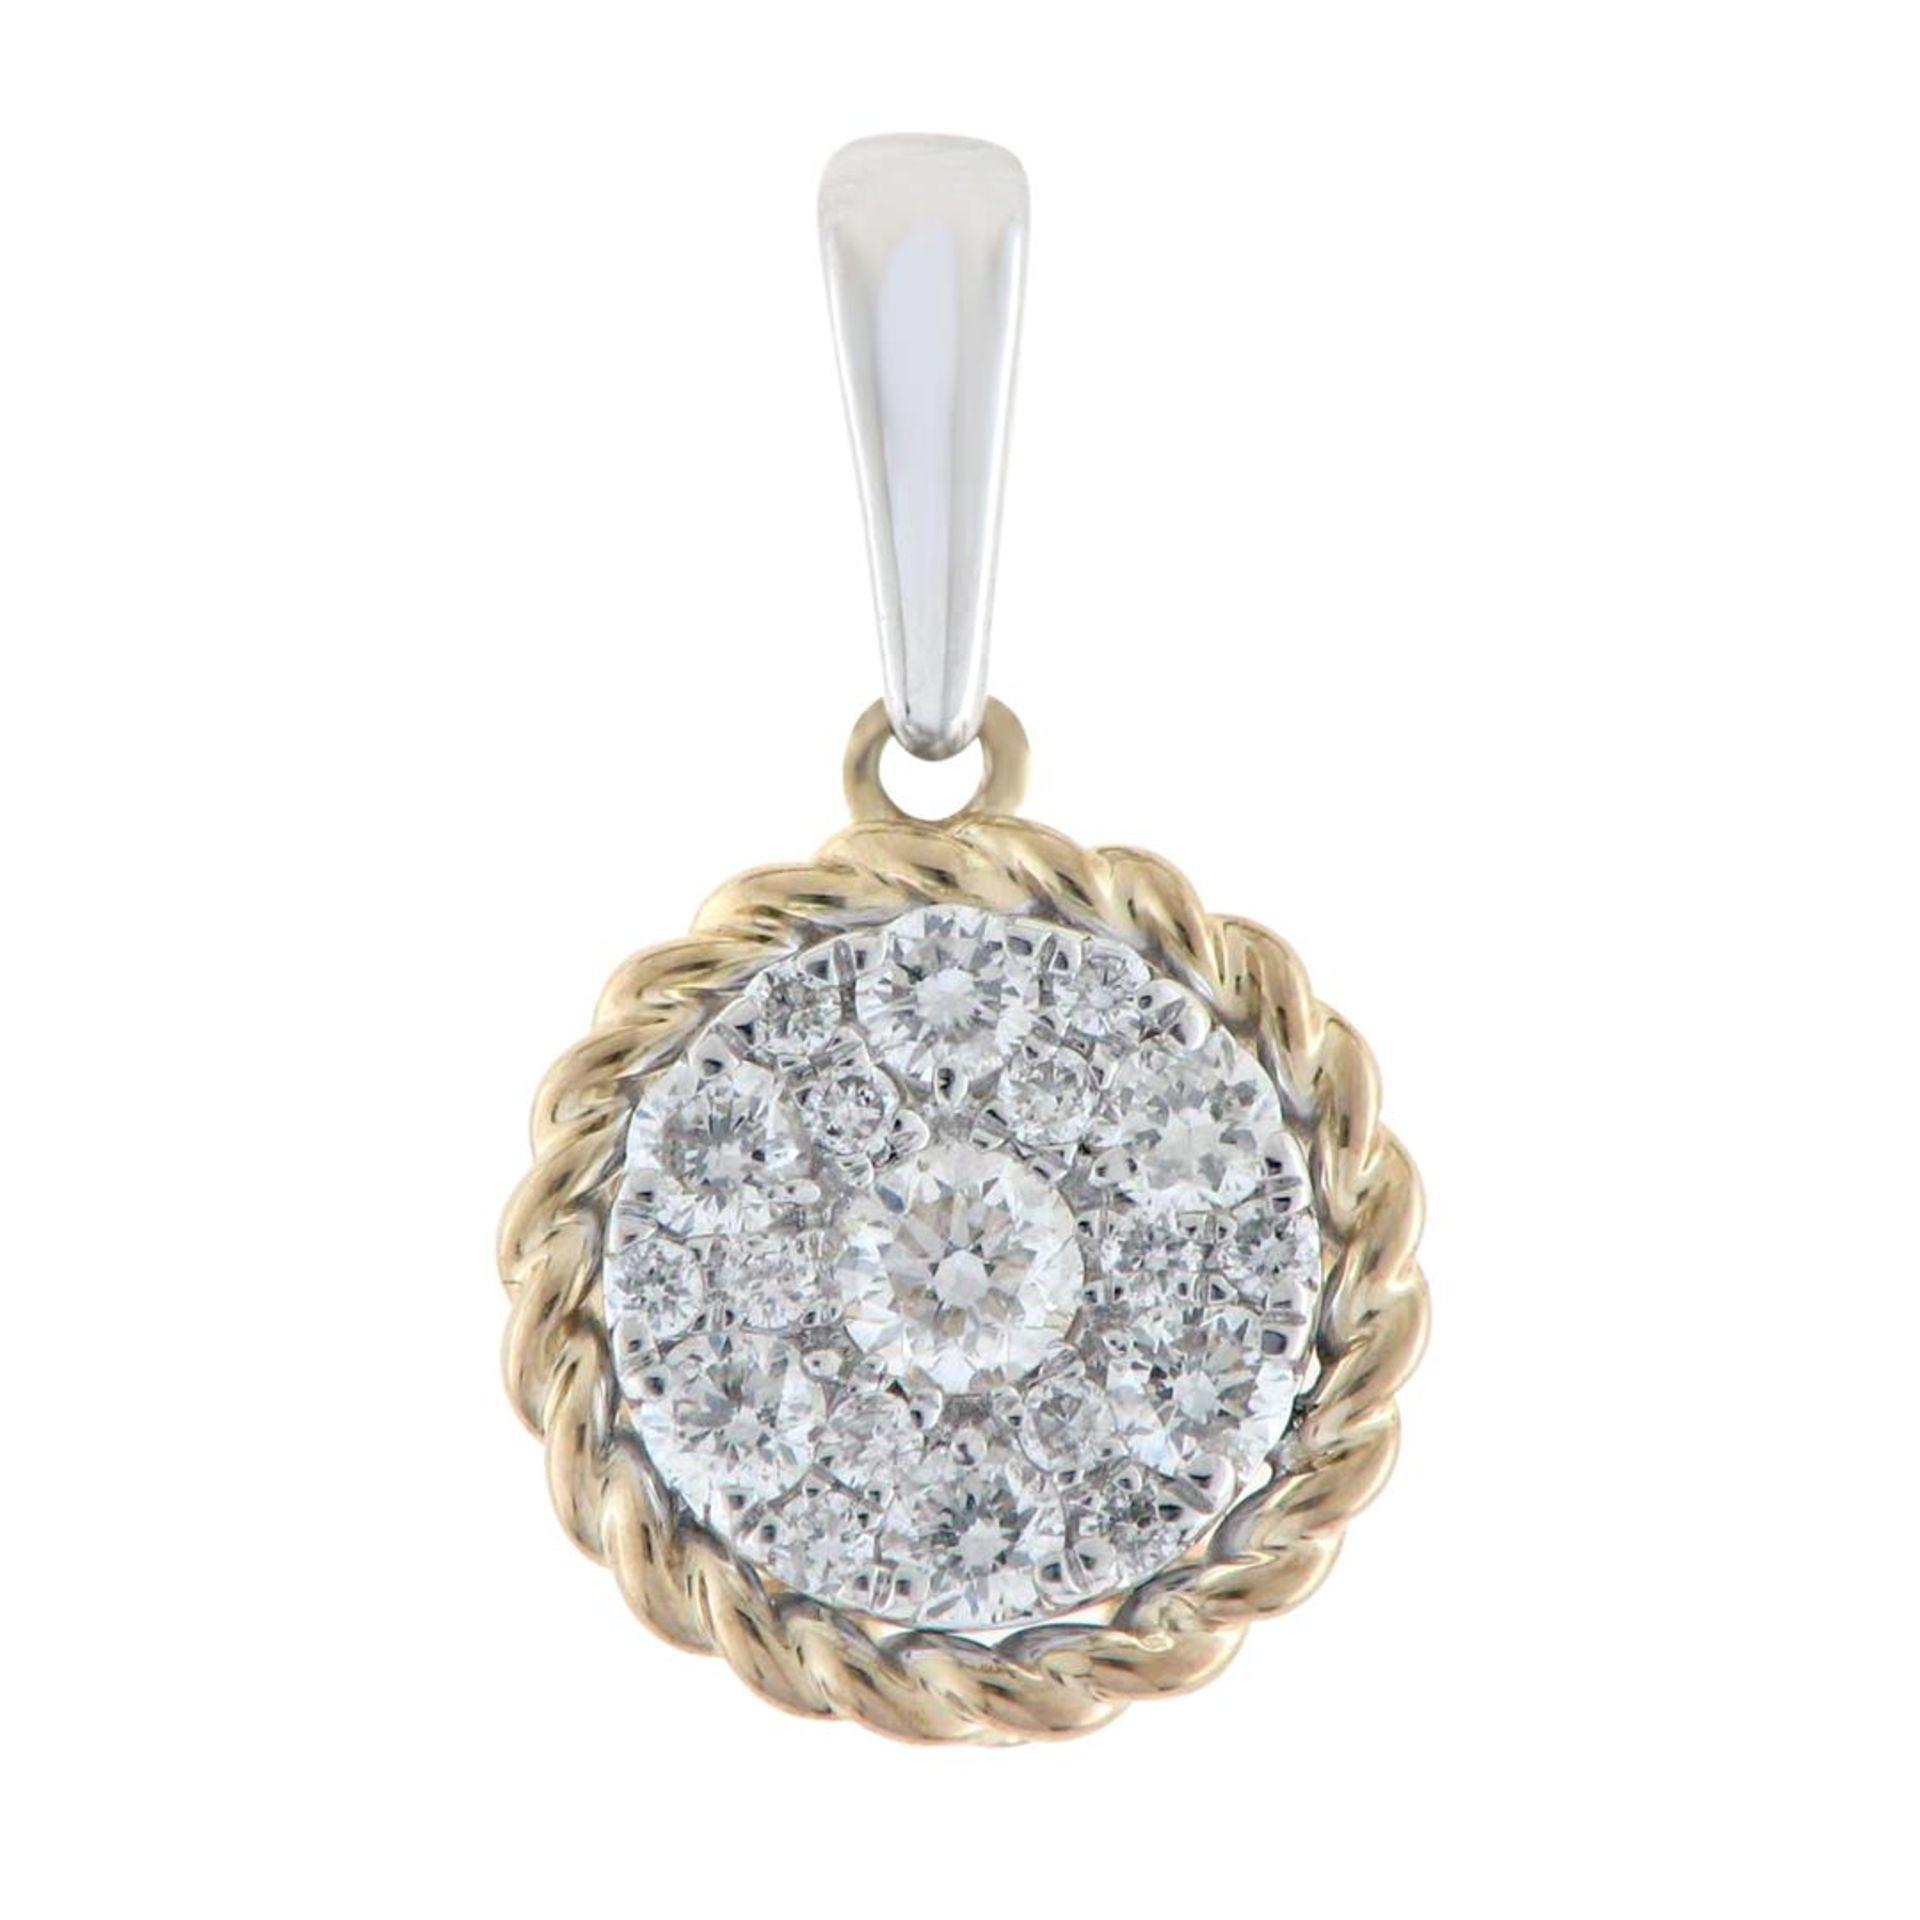 14K Two-Tone Gold 0.34CTW Diamond Pendant Necklace, (I1-I2/H-I)